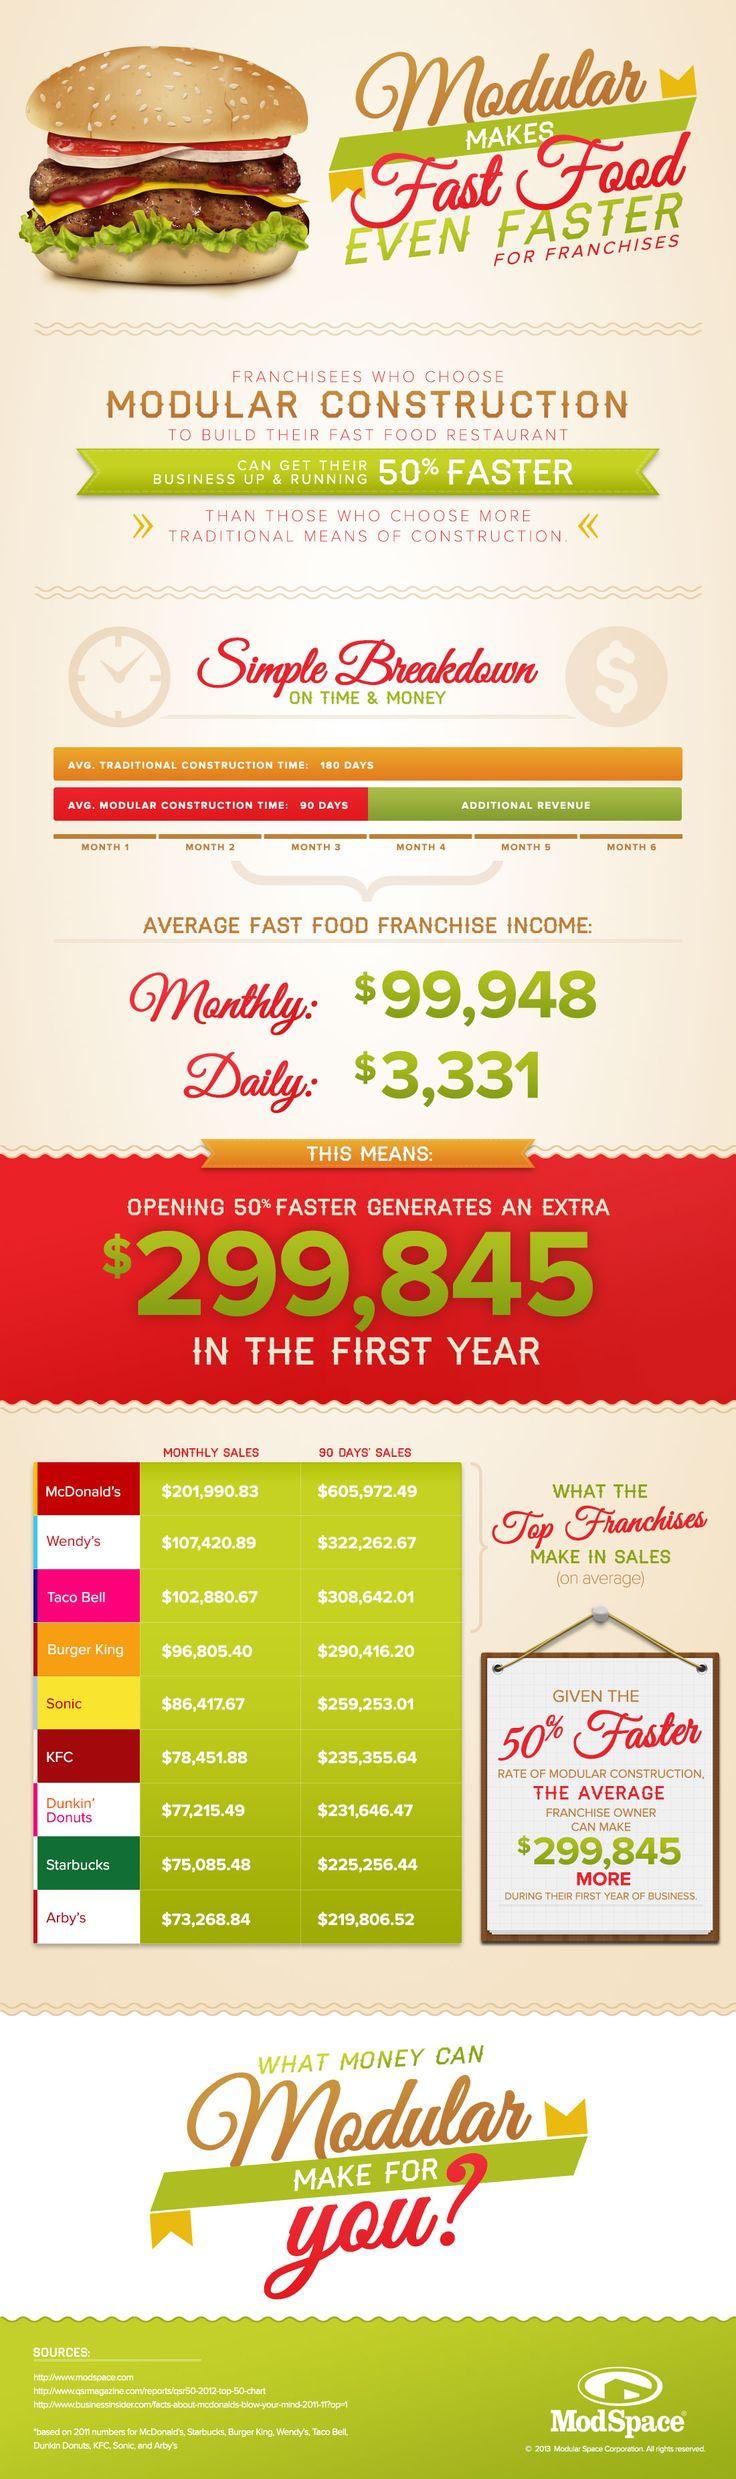 Franchise-Infographic-modular franchises open 50% faster